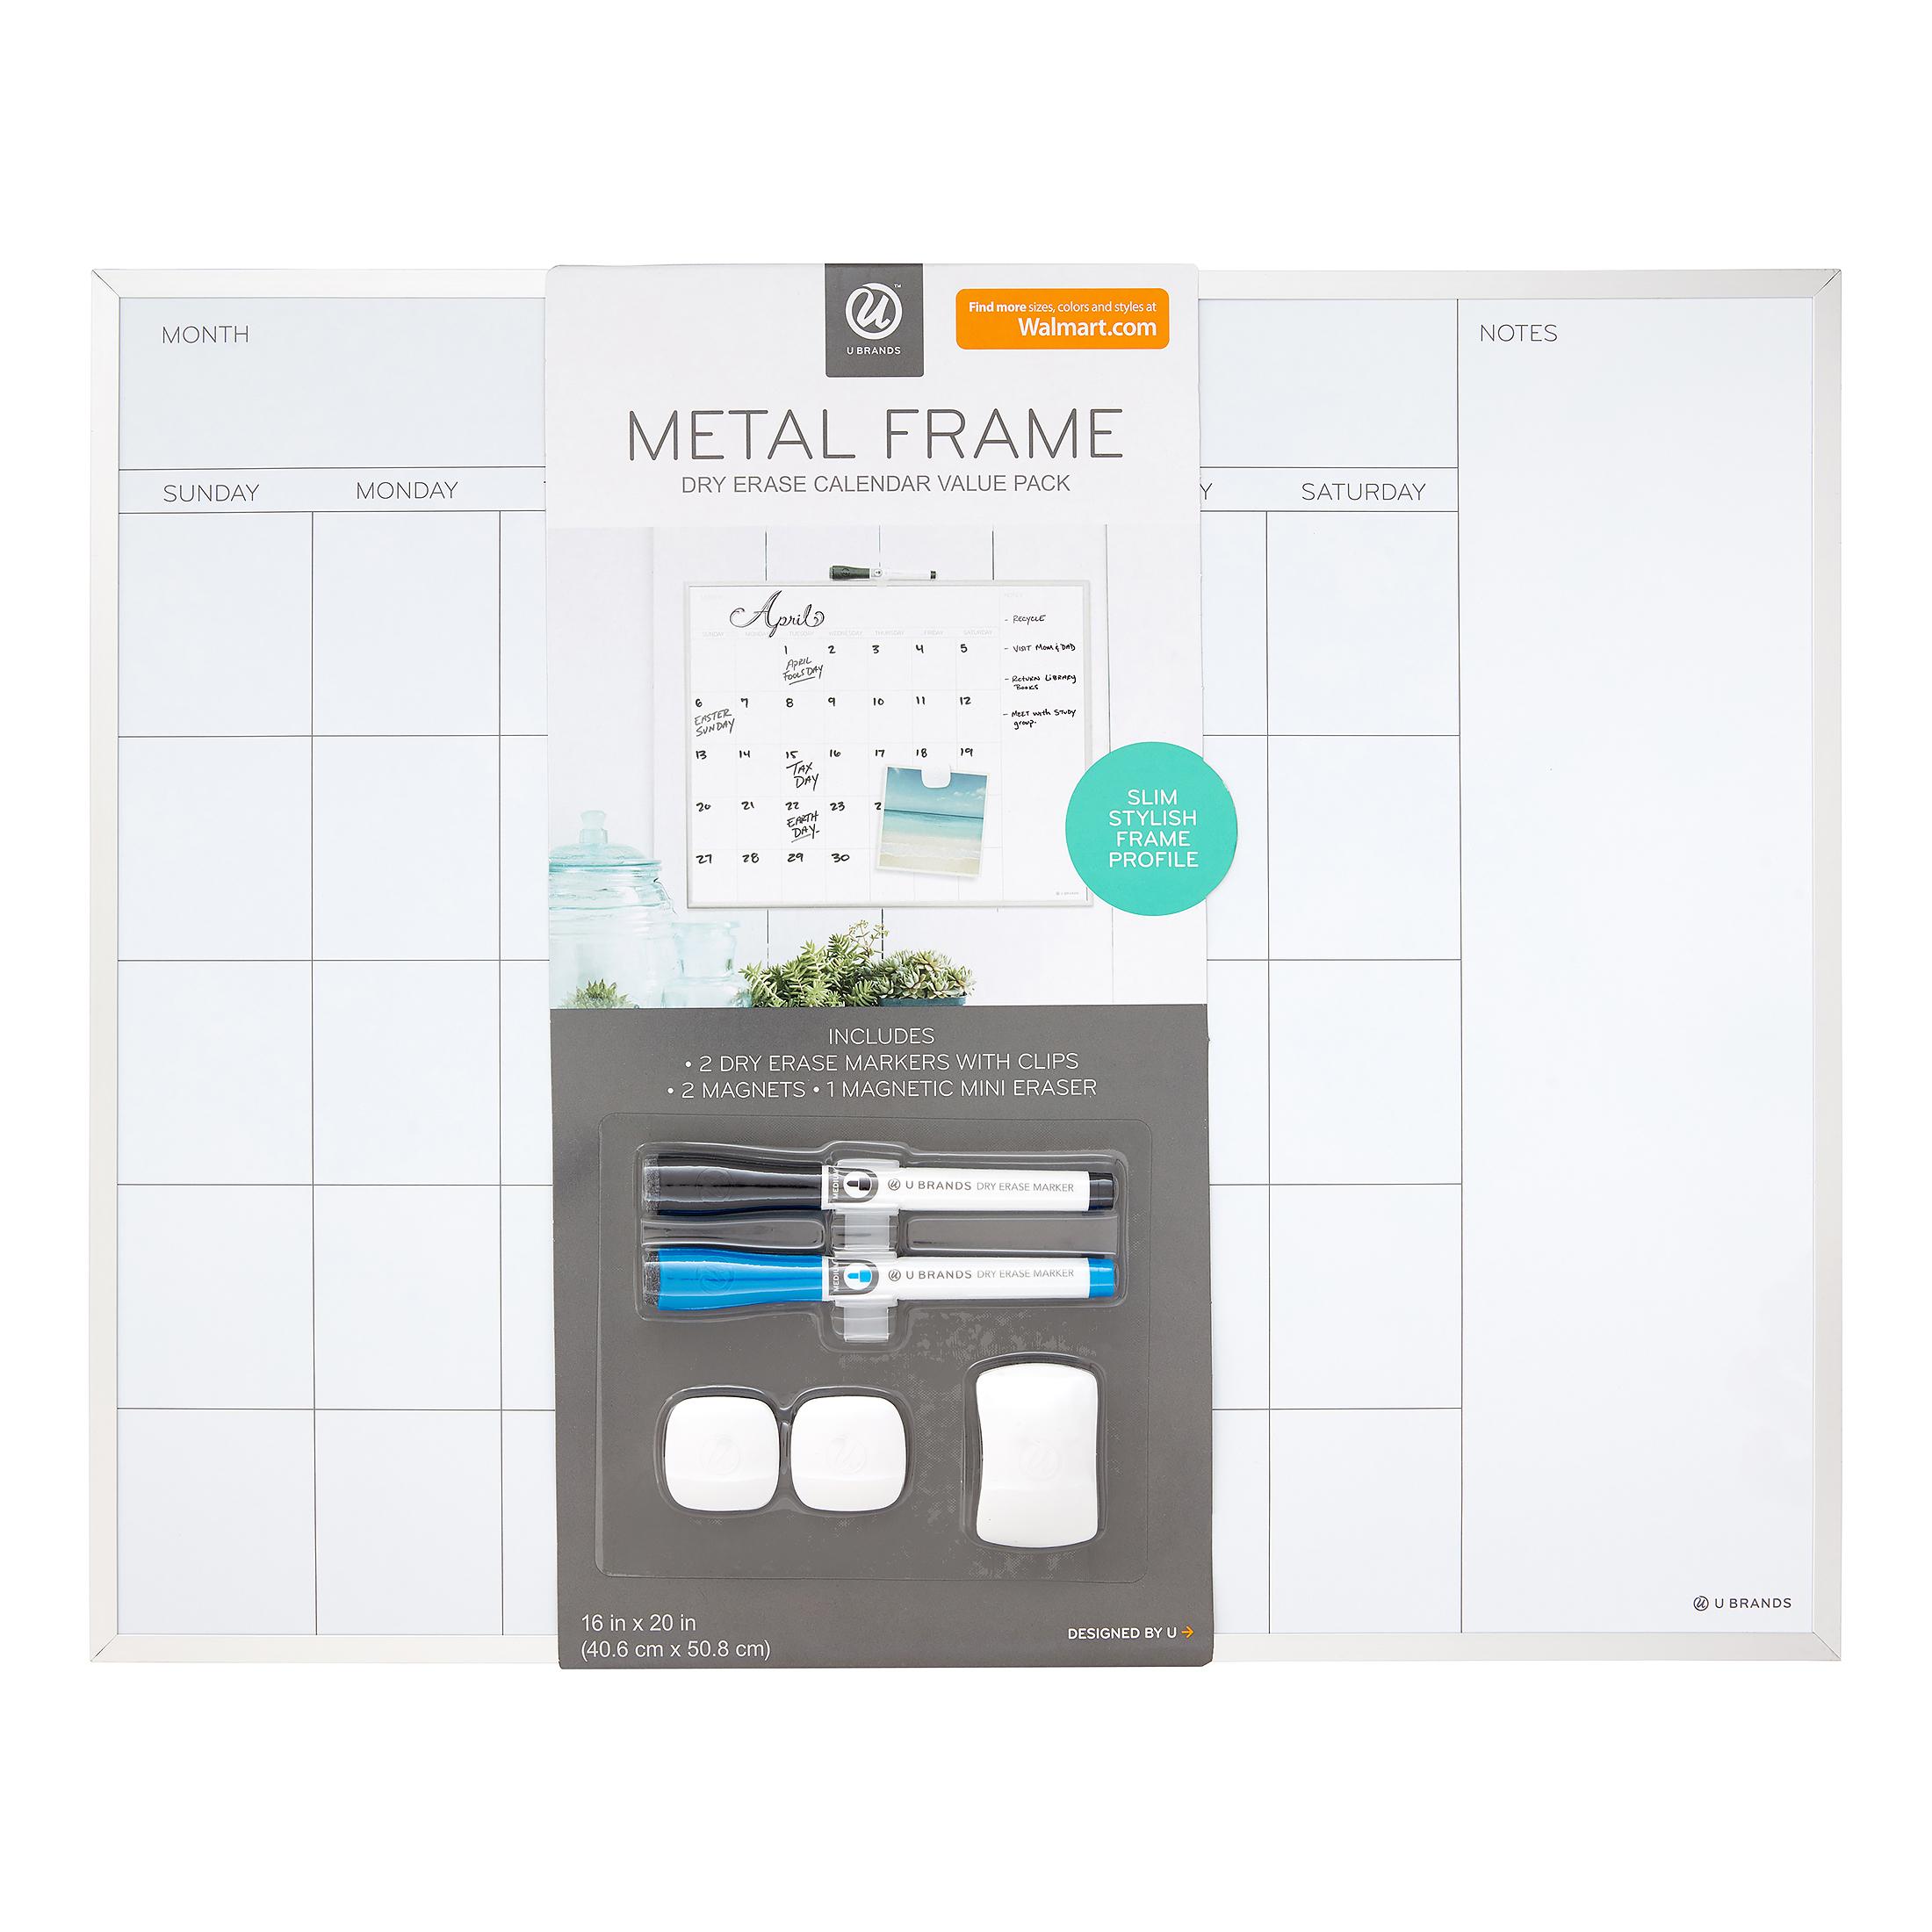 U Brands 16 X 20 Inch Magnetic Dry Erase Monthly Calendar Board